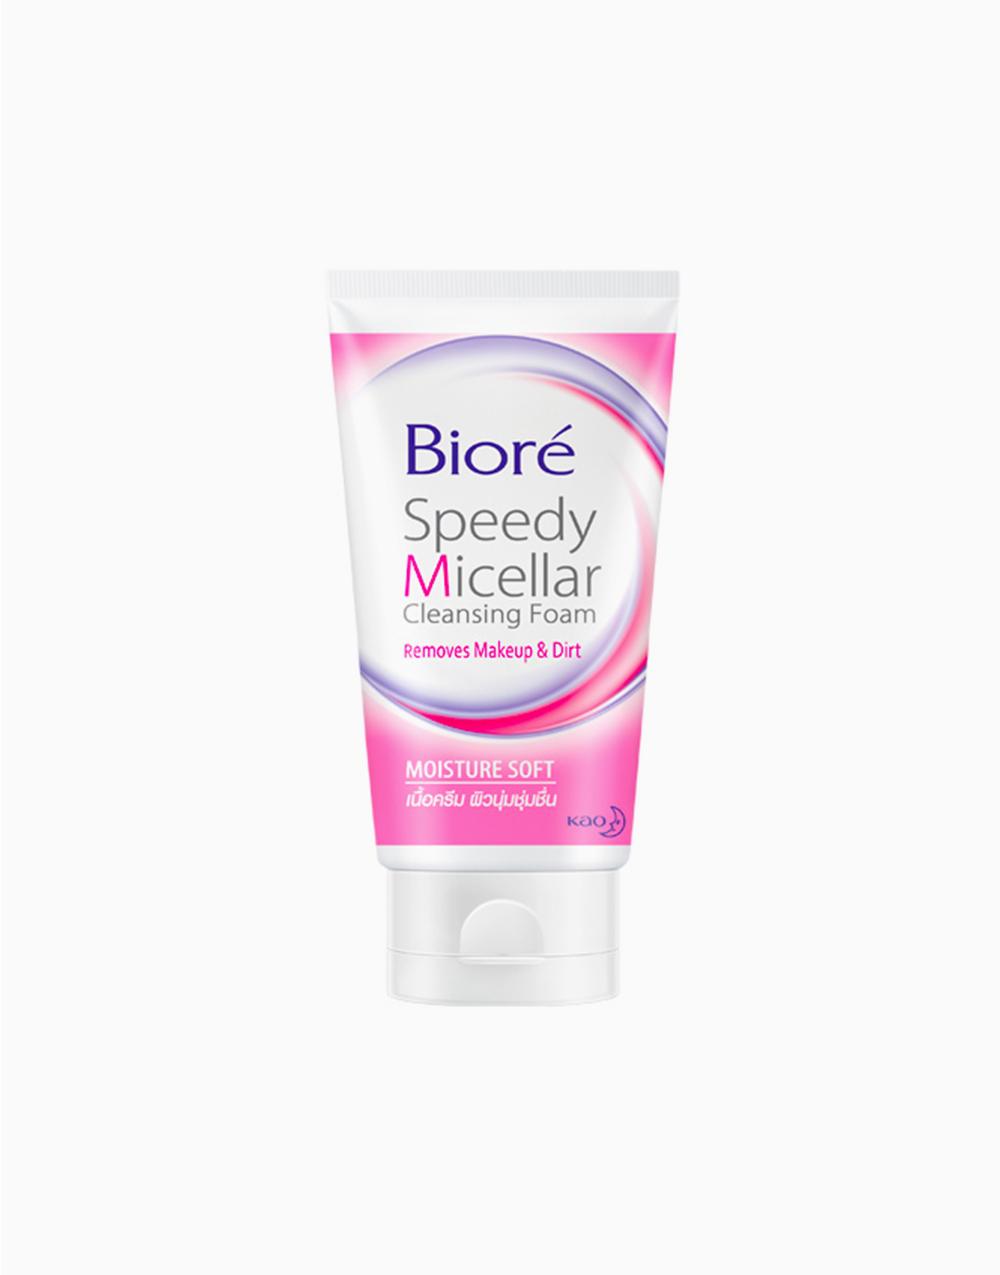 Speedy Micellar Cleansing Foam - Moisture Soft (40g) by Biore